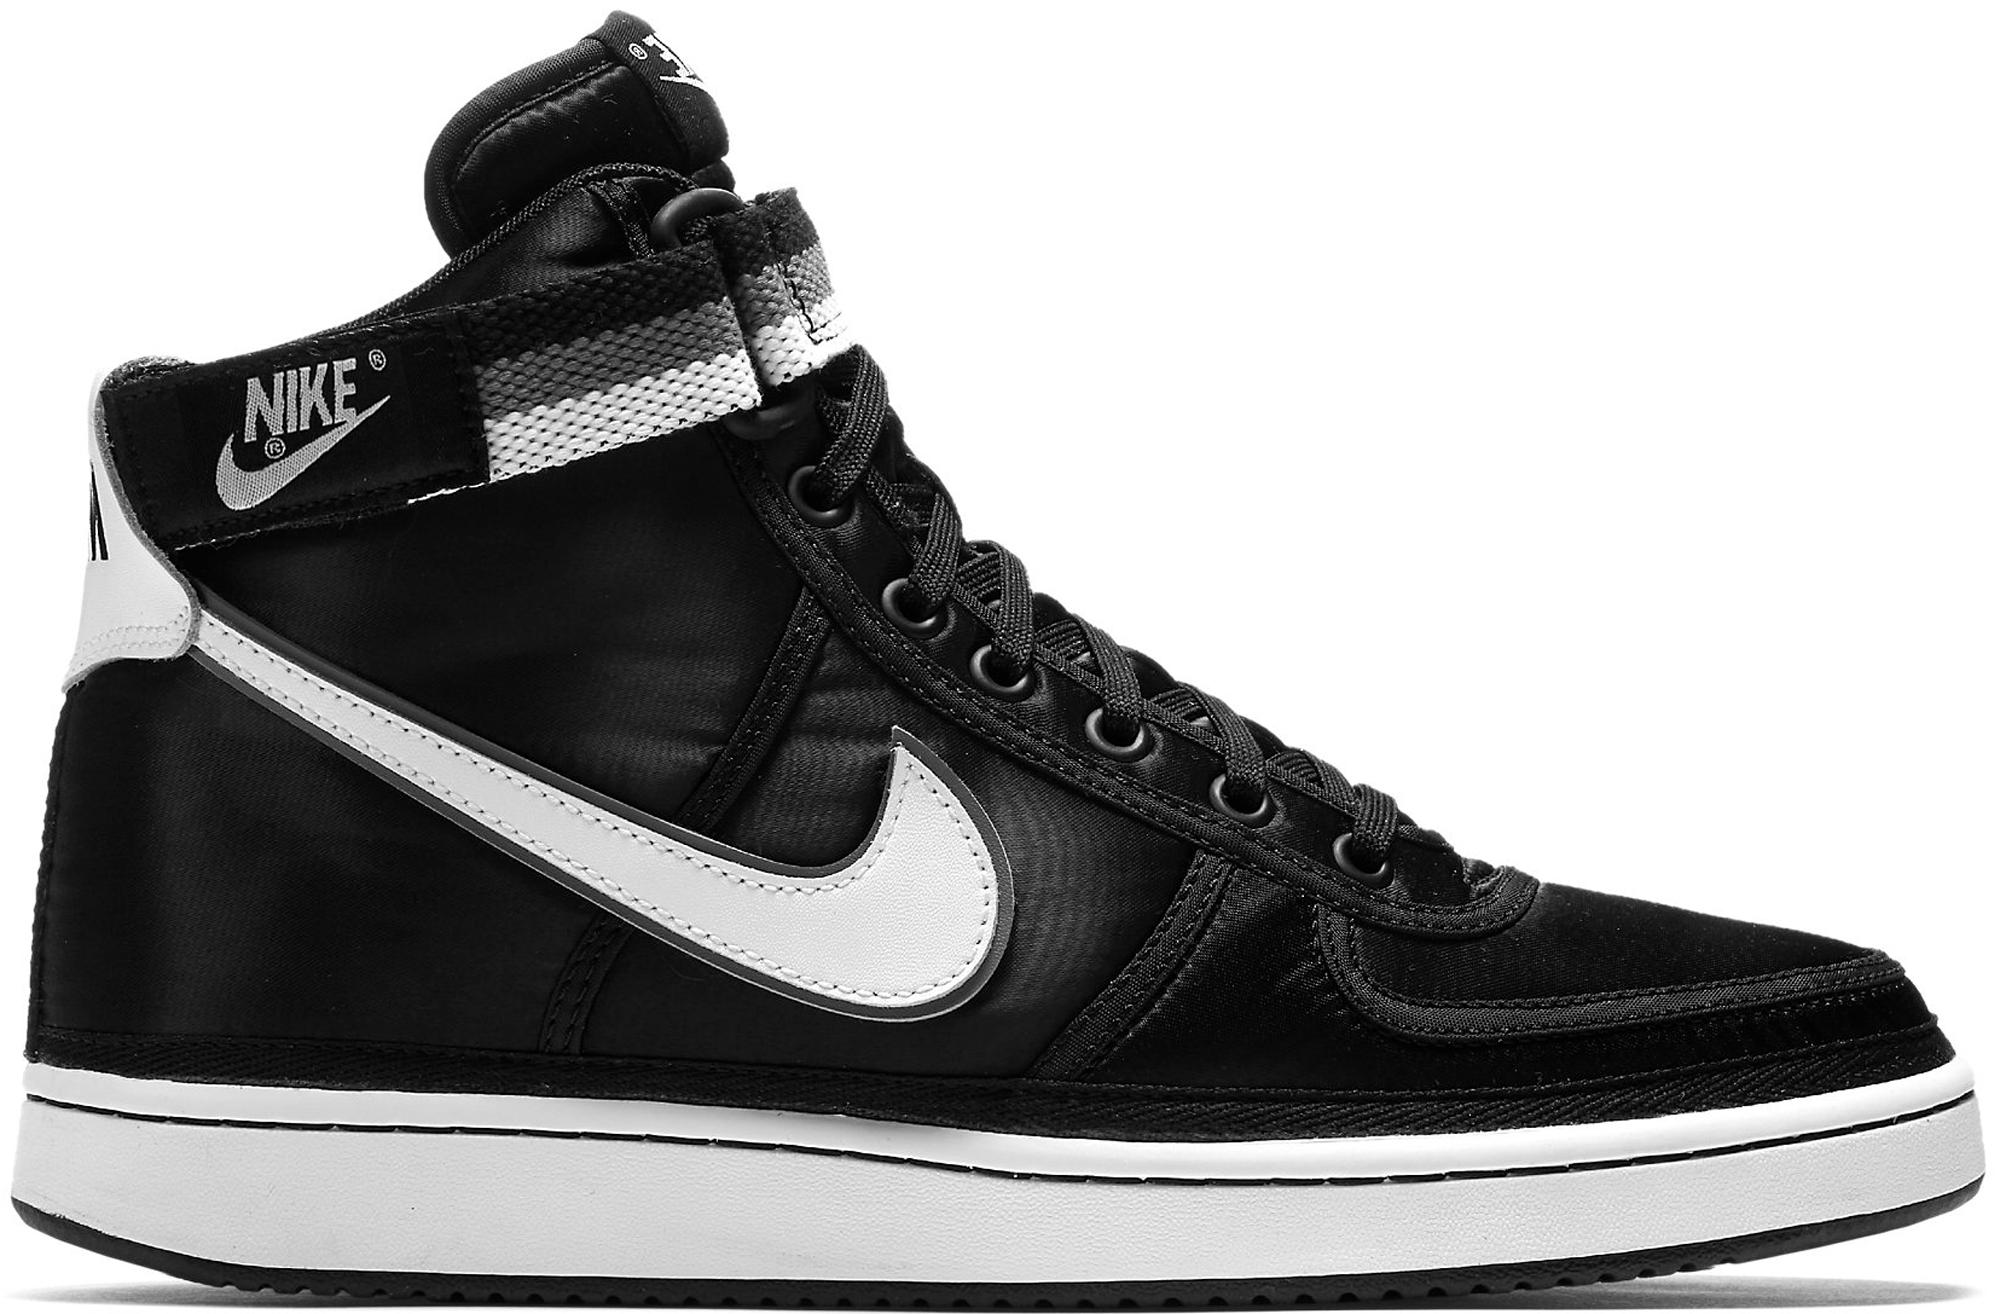 Nike Vandal High Supreme Black White